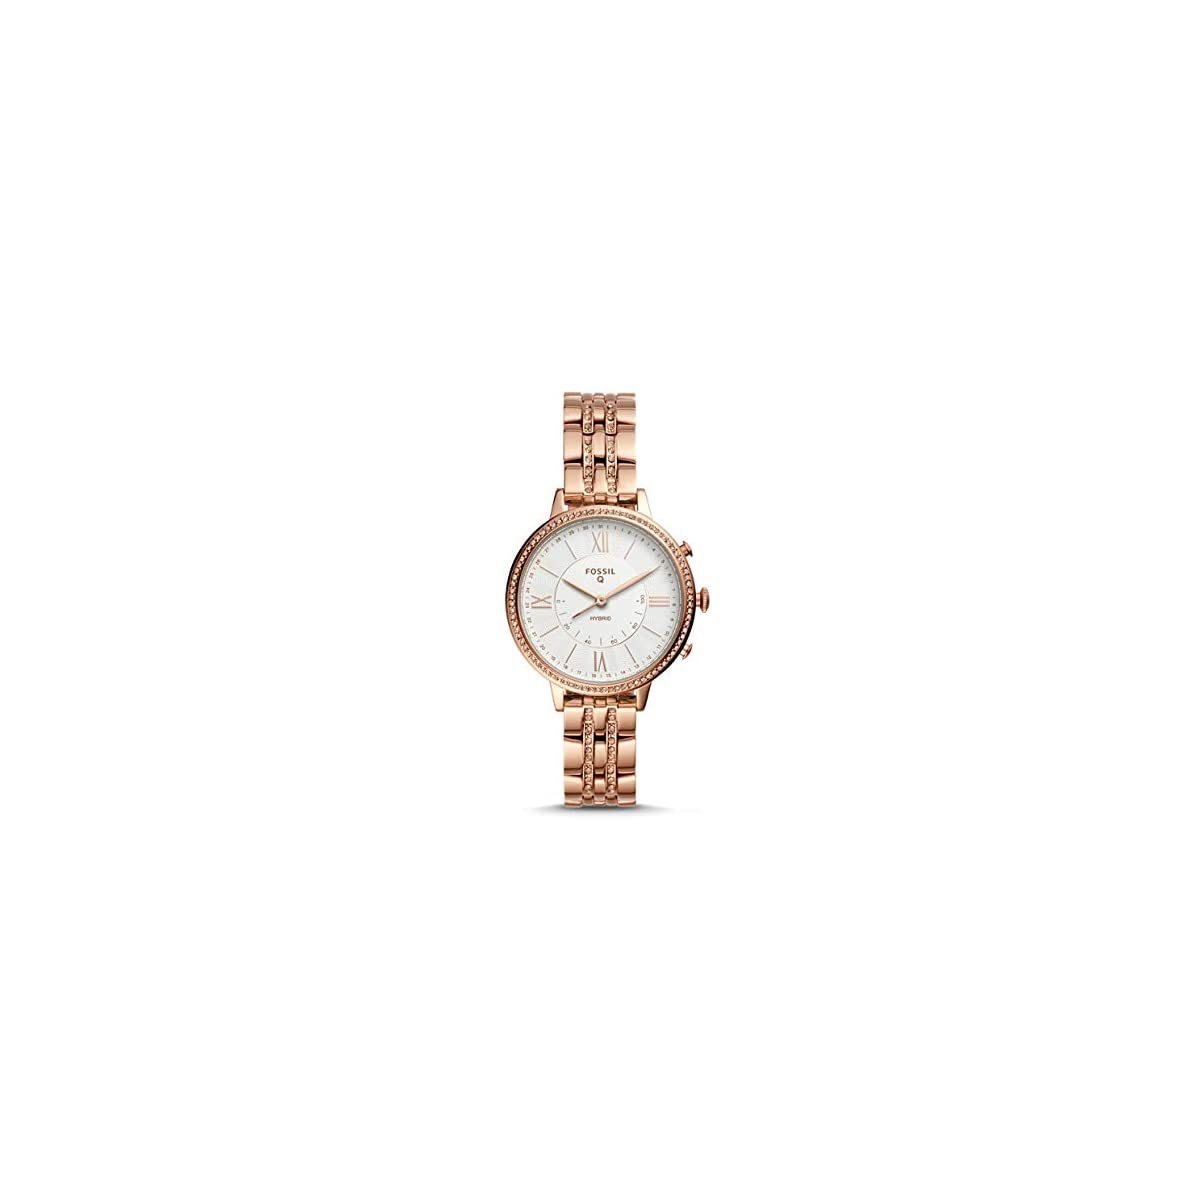 41lOLWsn3uL. SS1200  - Fossil Jacqueline Hybrid FTW5034 - Reloj Inteligente para Mujer (Acero Inoxidable), Color Oro Rosa